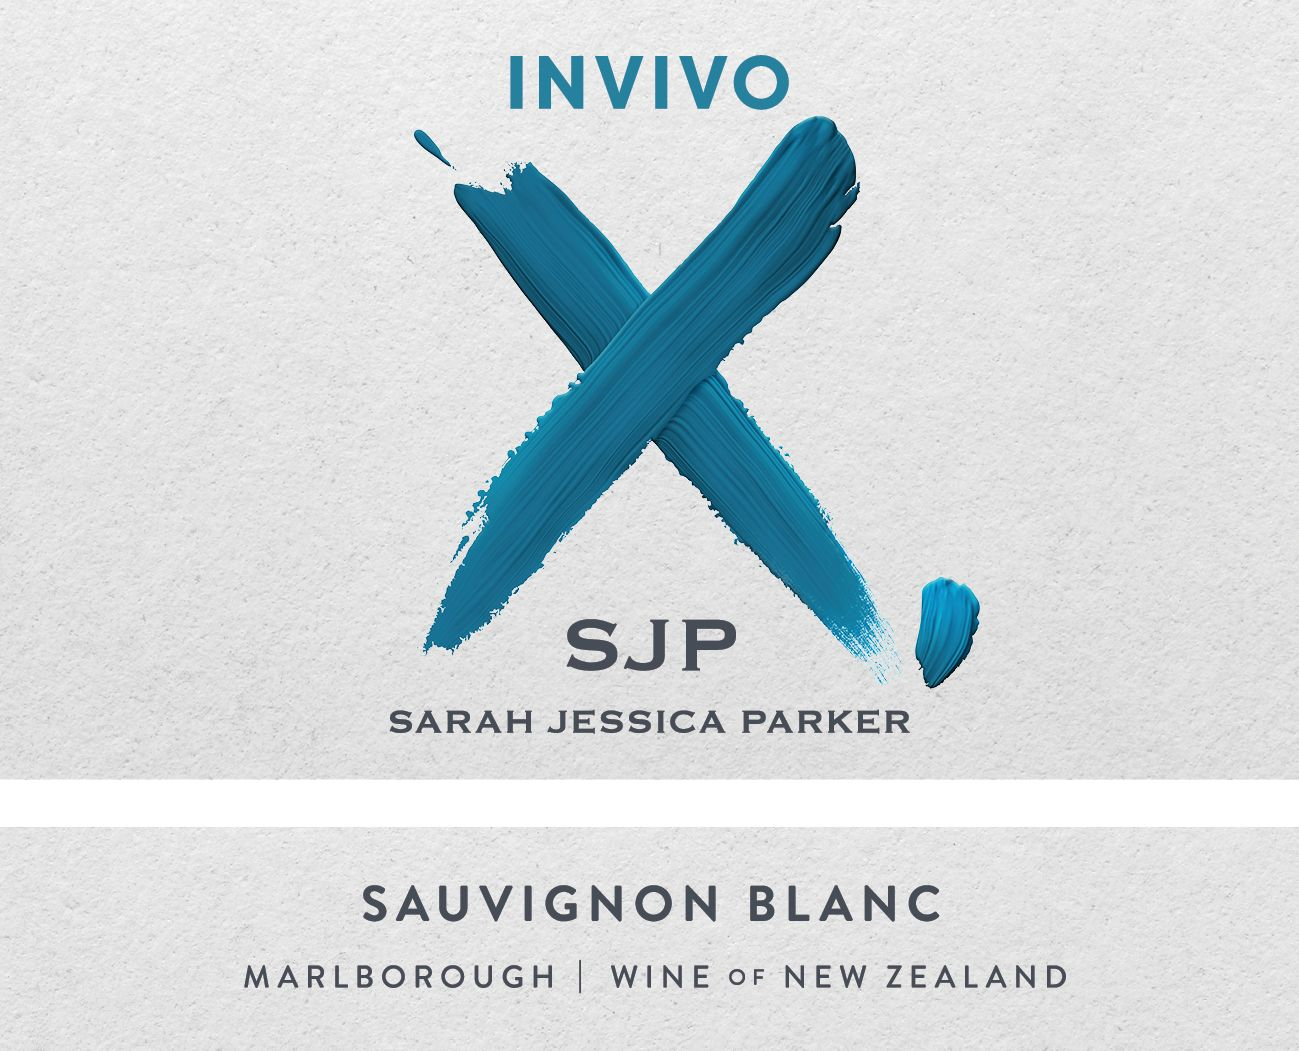 Invivo X by Sarah Jessica Parker Sauvignon Blanc 2019